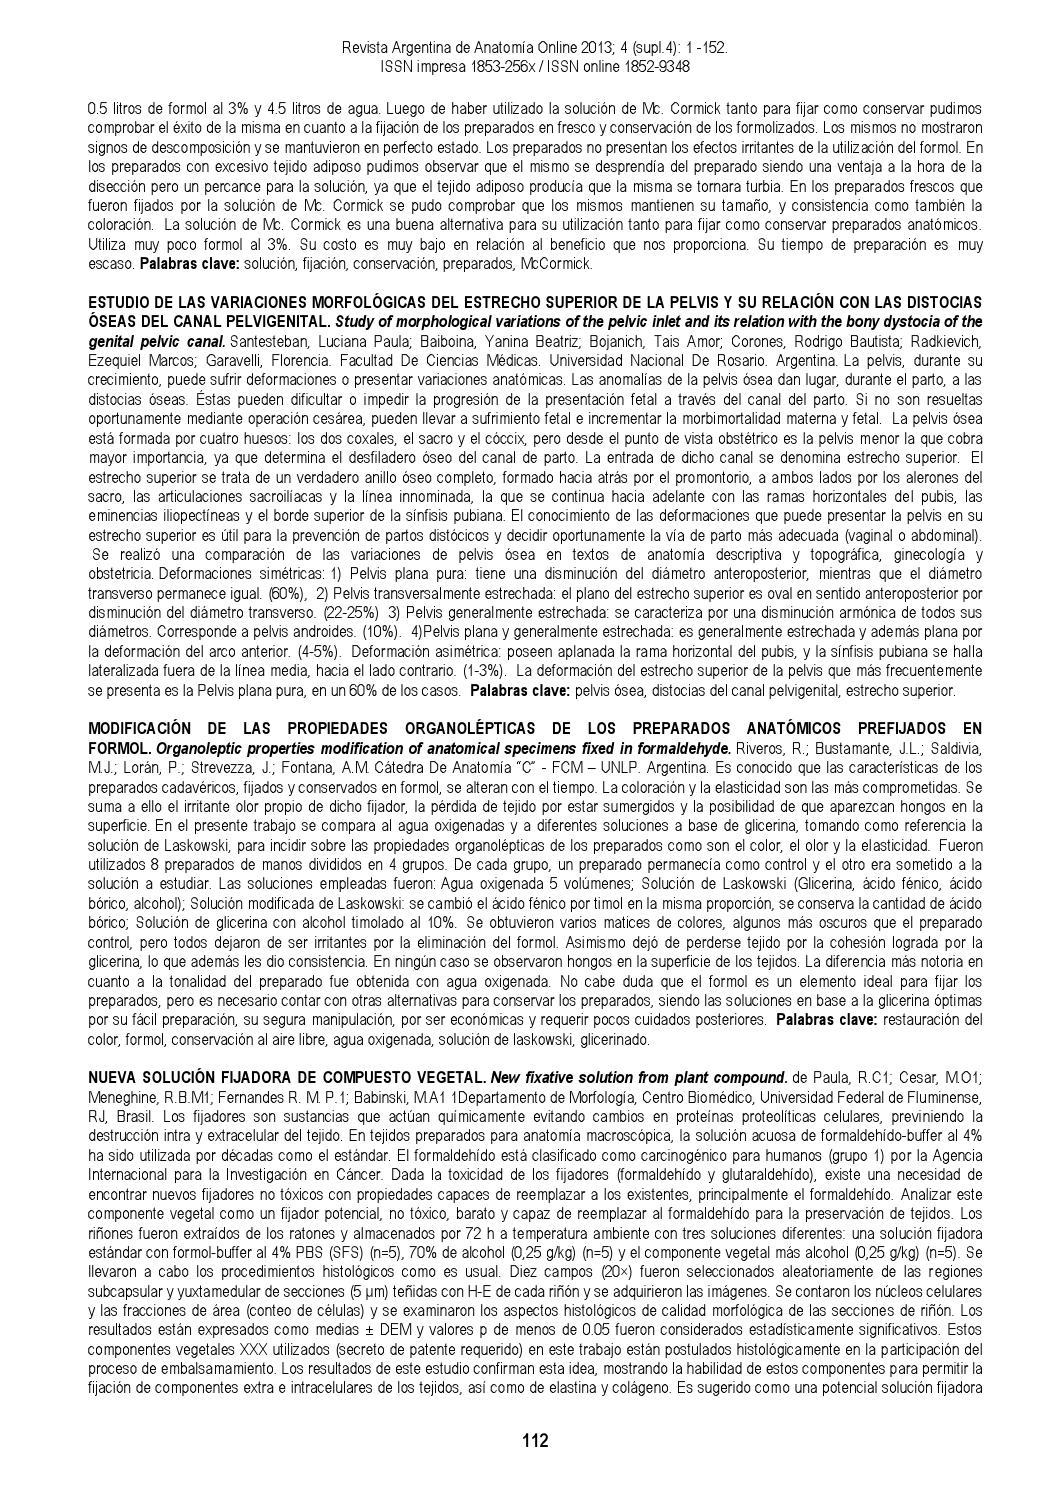 Rev. Arg. Anat. Onl. 2013; 4(supl4):1-152. by Nicolas Ottone - issuu